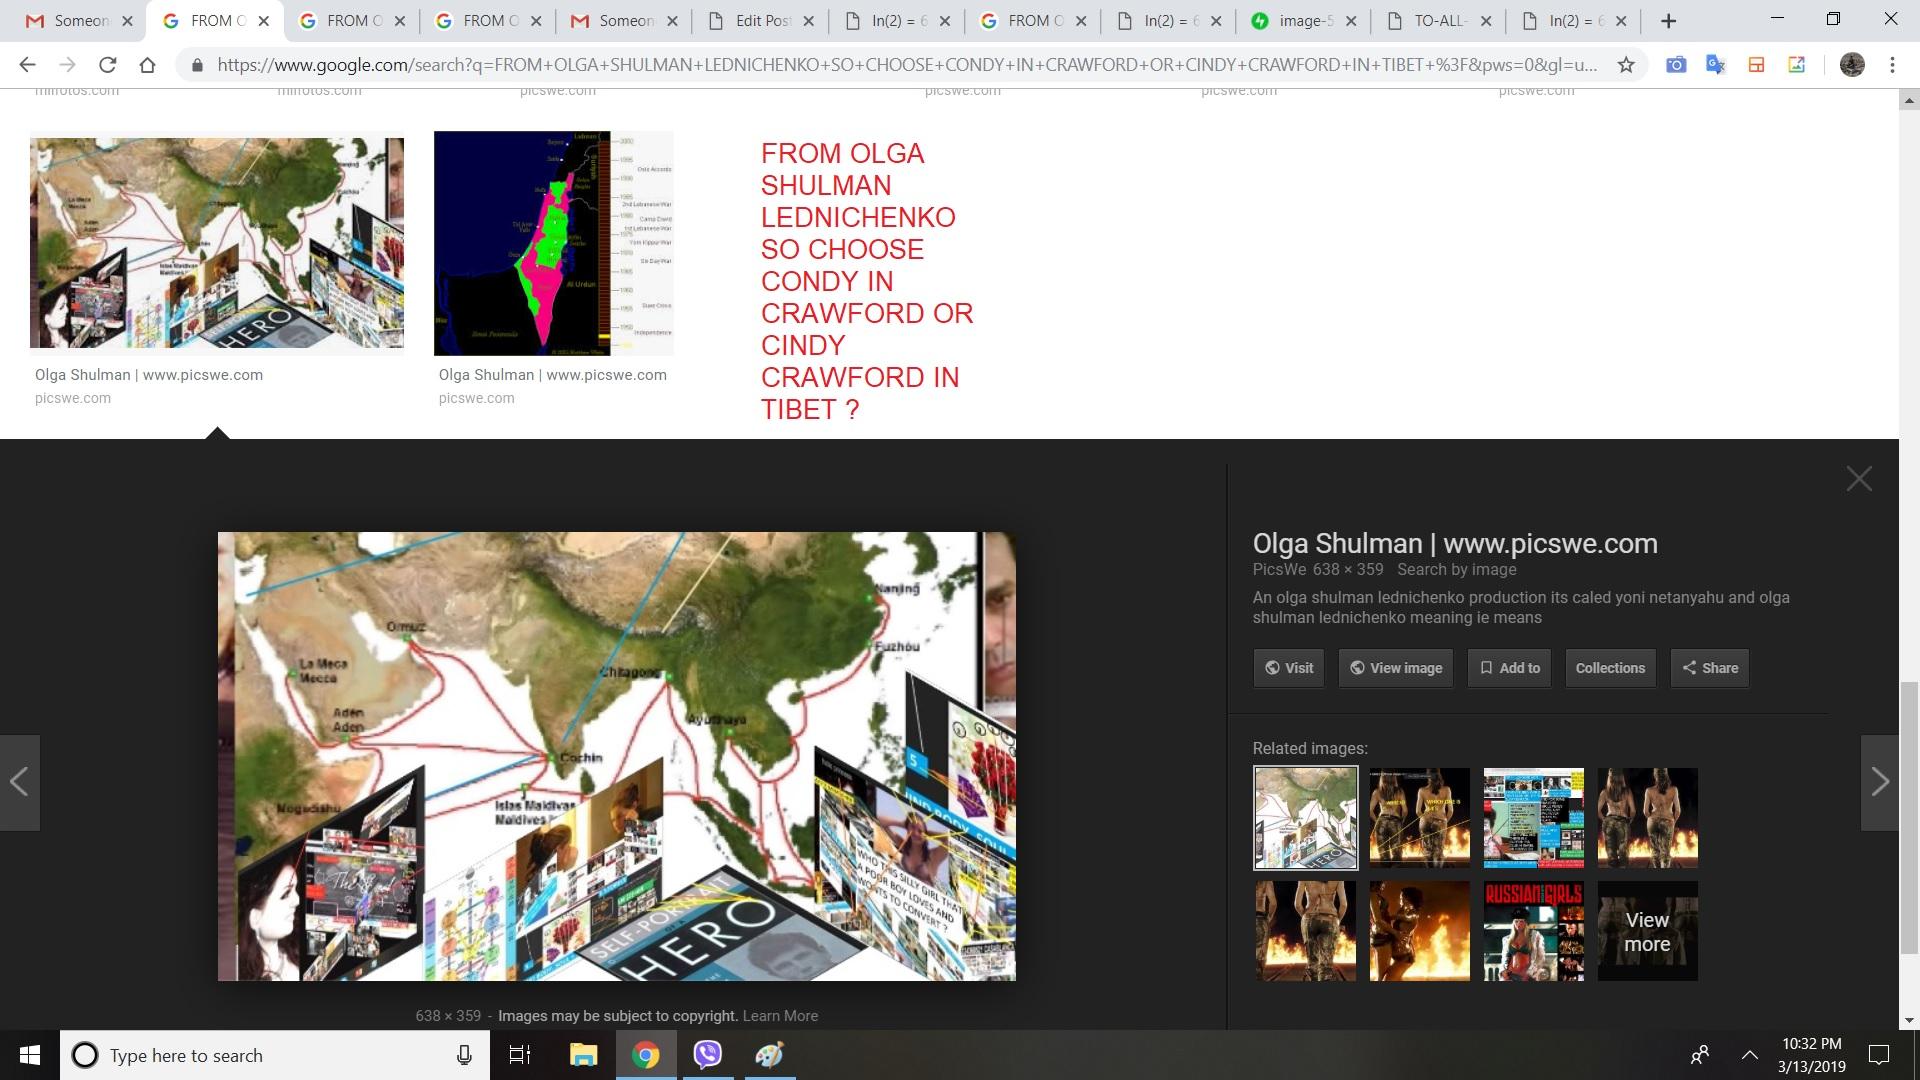 FROM OLGA SHULMAN LEDNICHENKO SO CHOOSE CONDY IN CRAWFORD OR CINDY CRAWFORD IN TIBET